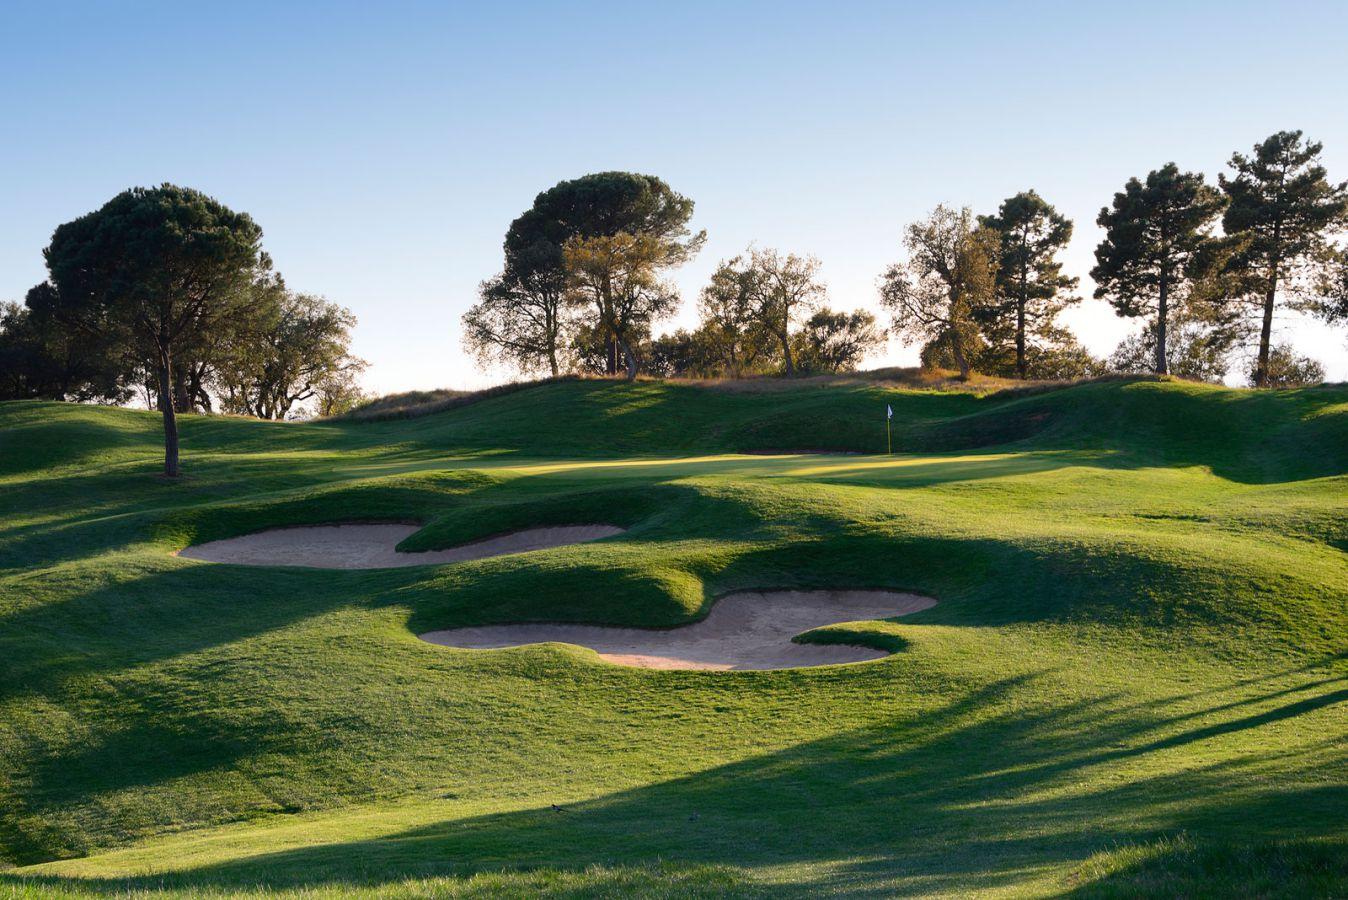 pga-catlunya-golf-5